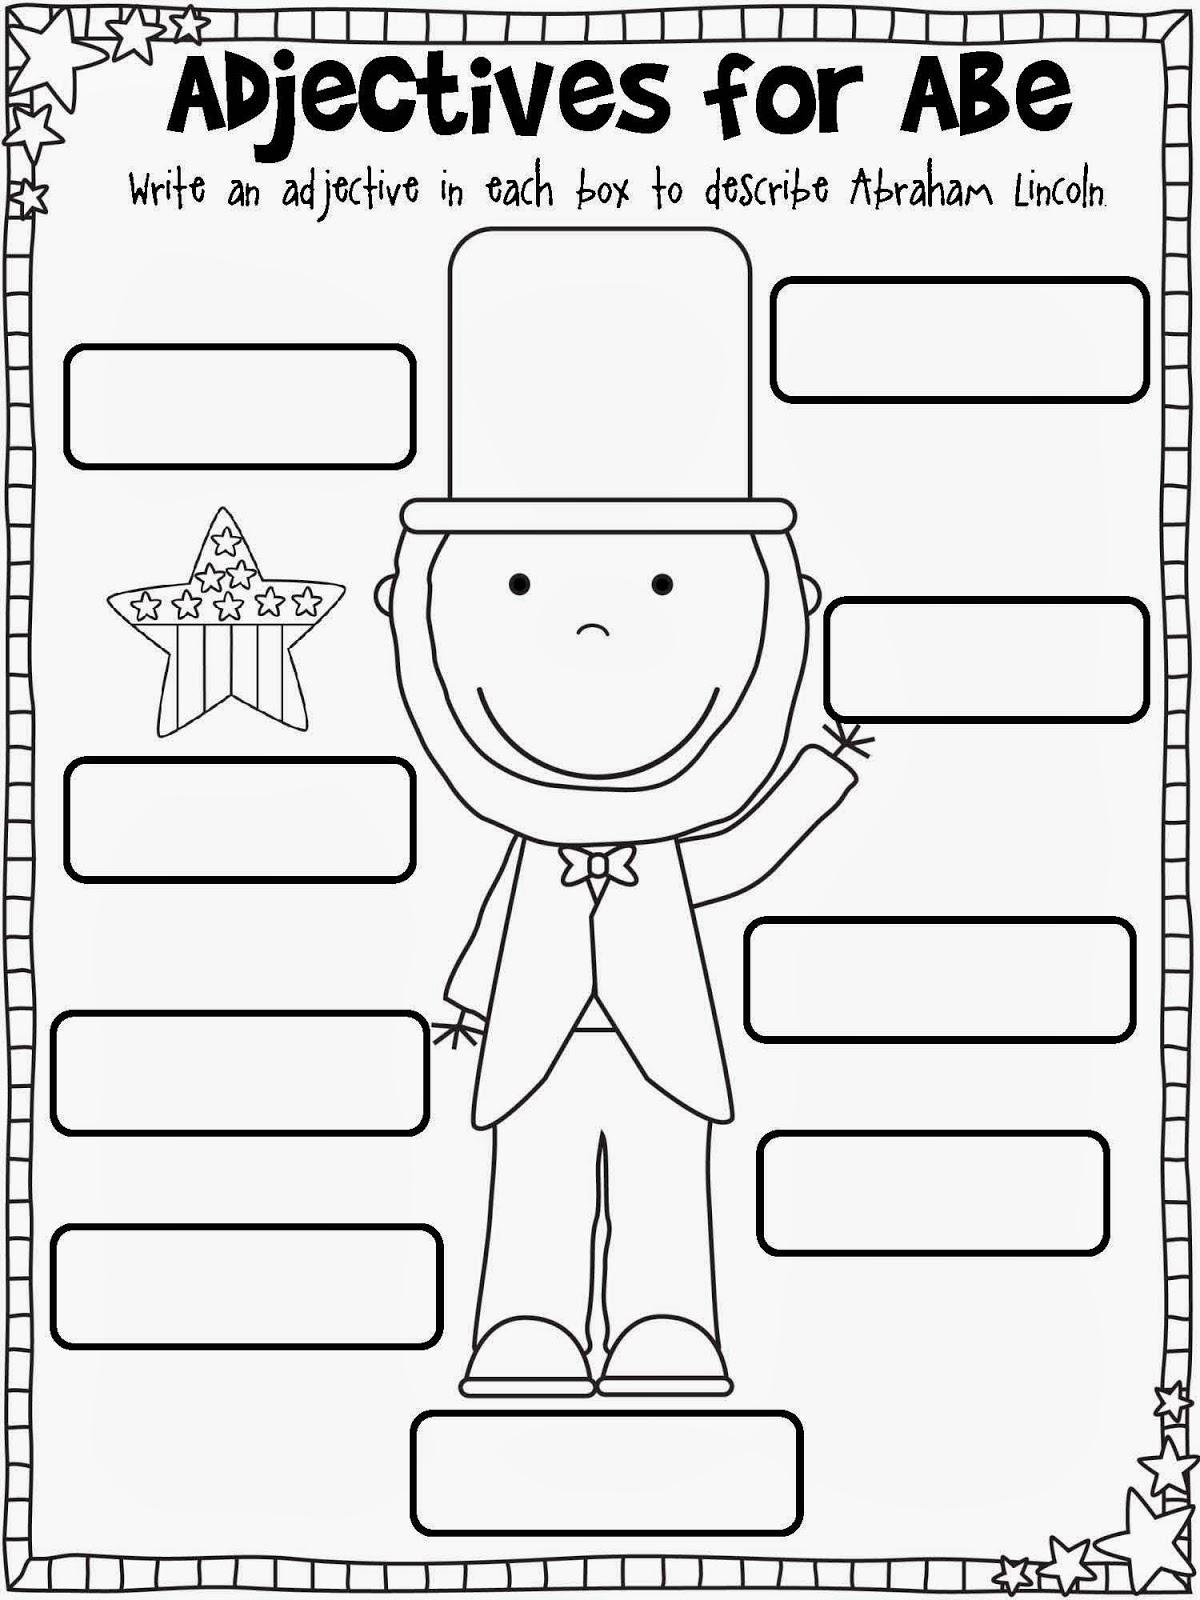 Abe lincoln worksheets for kindergarten